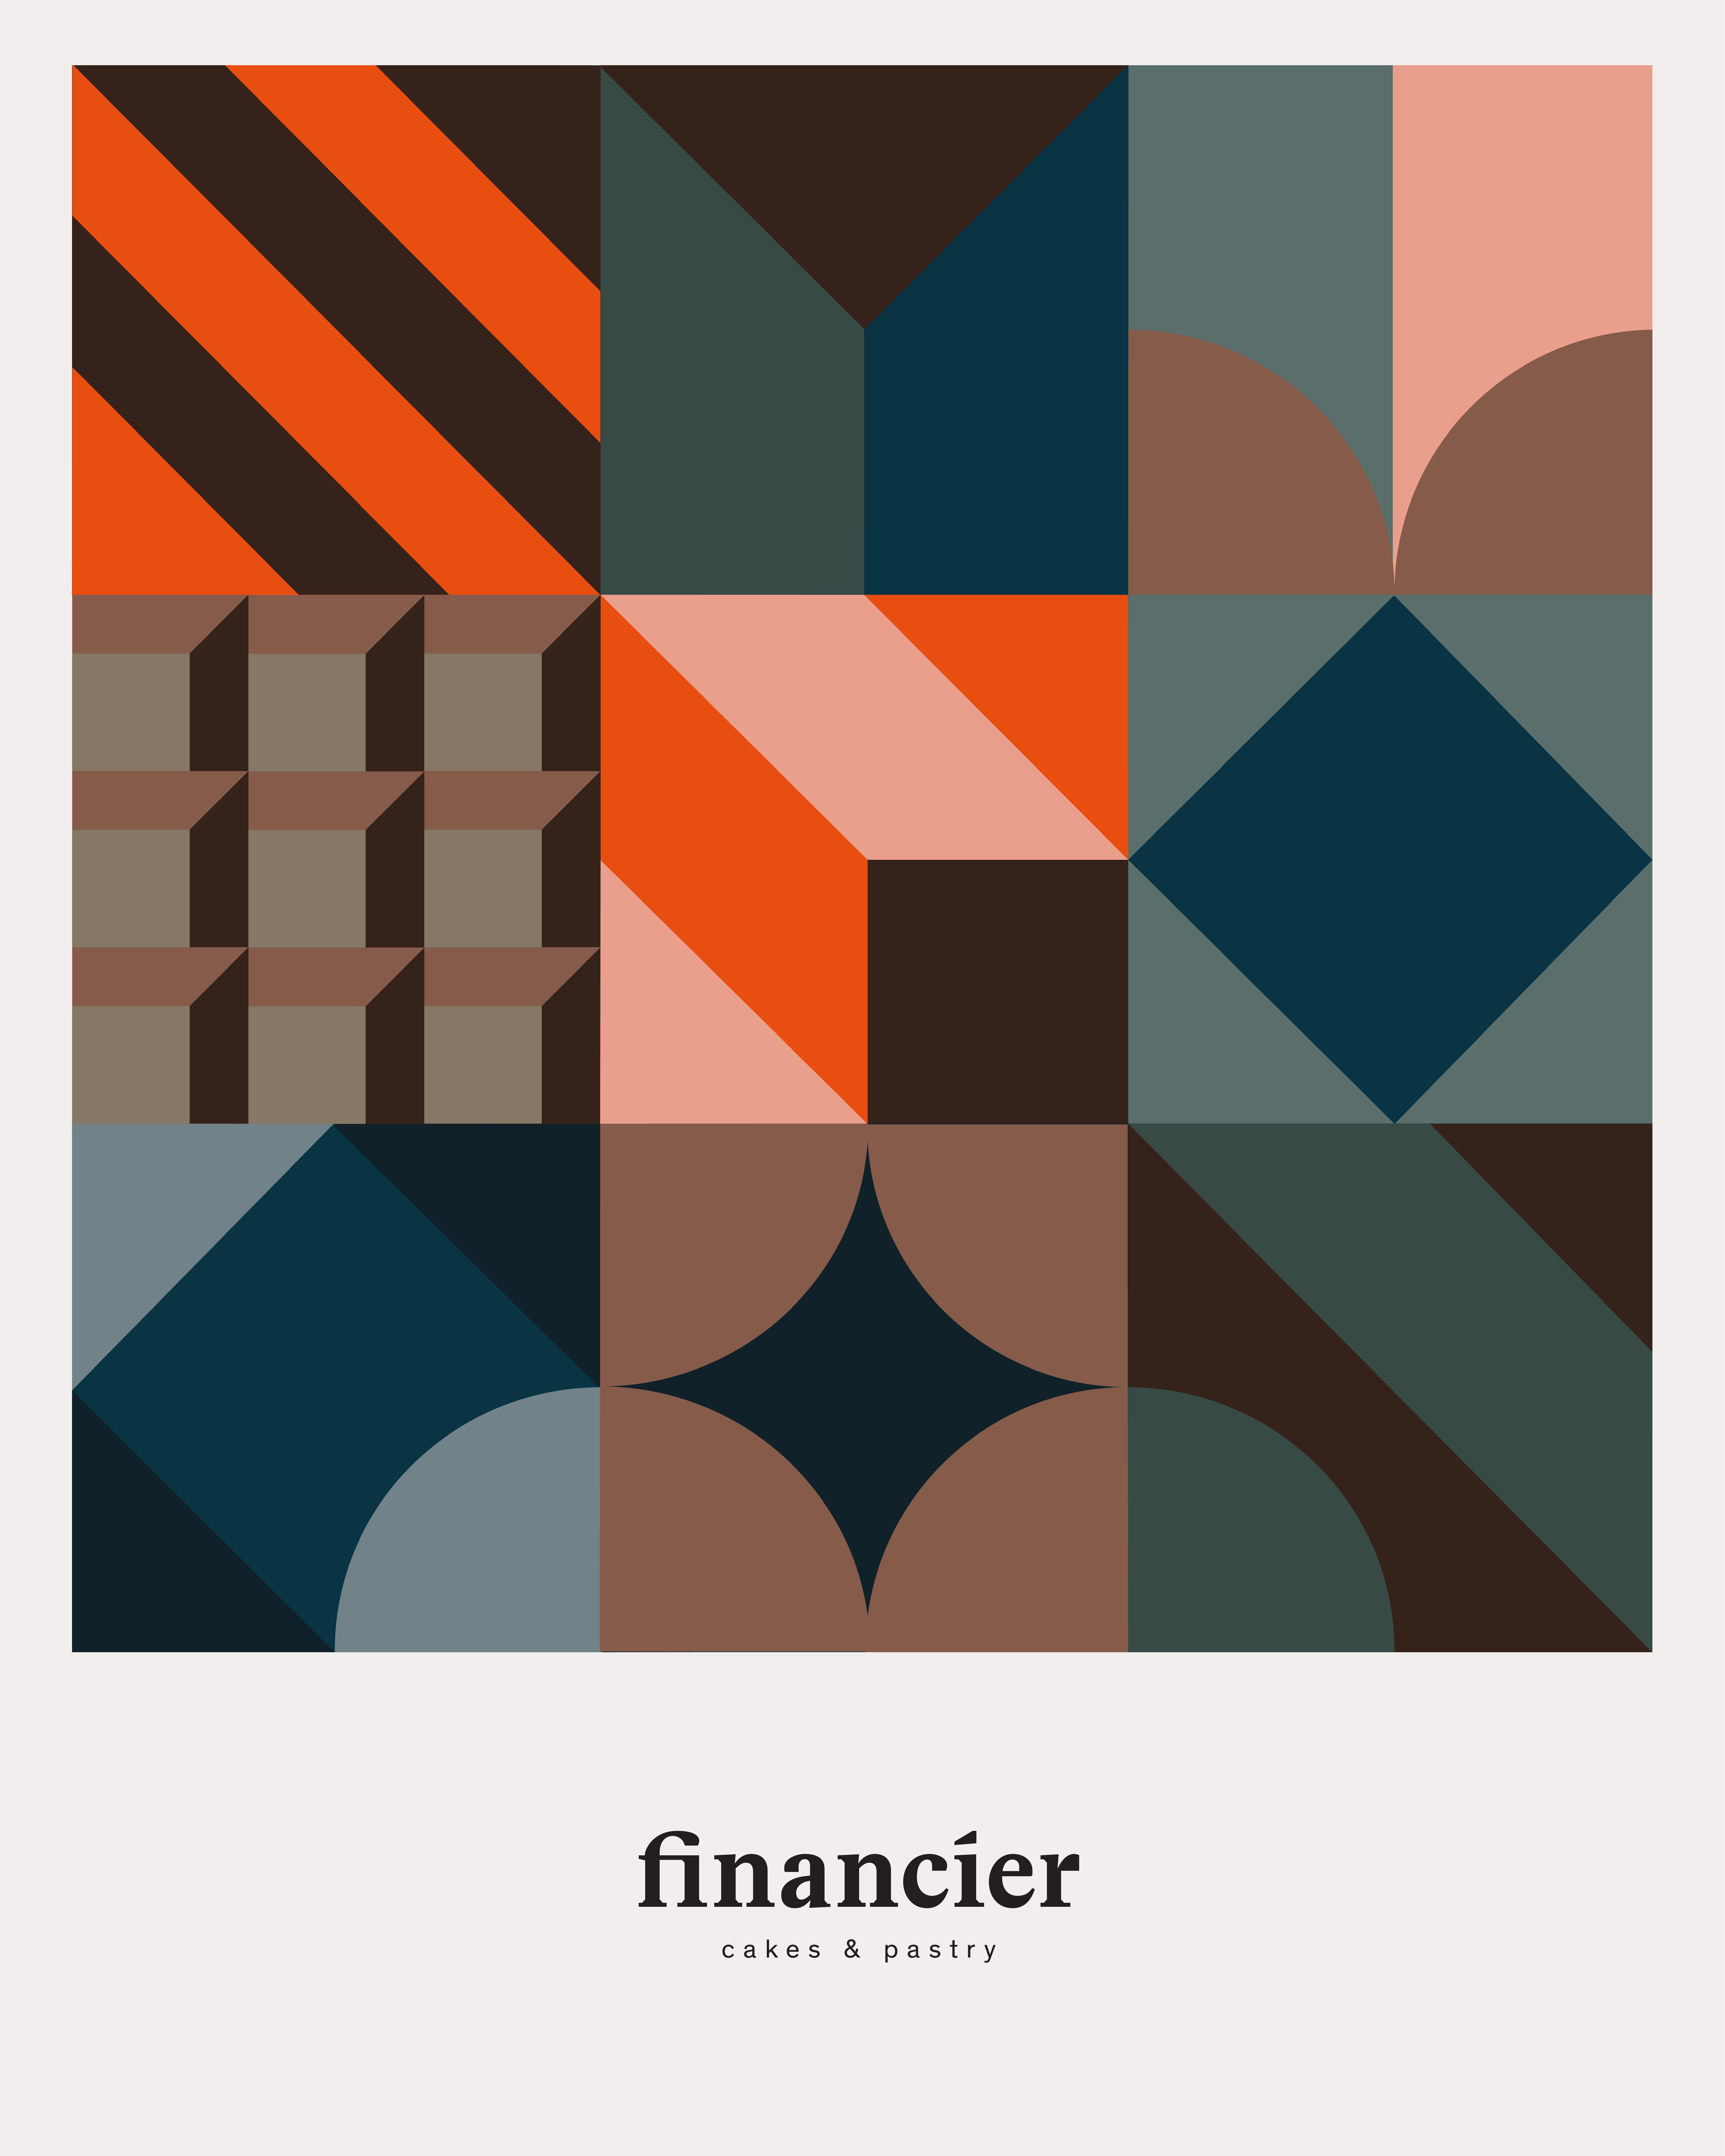 financier_poster_kvadrat-01